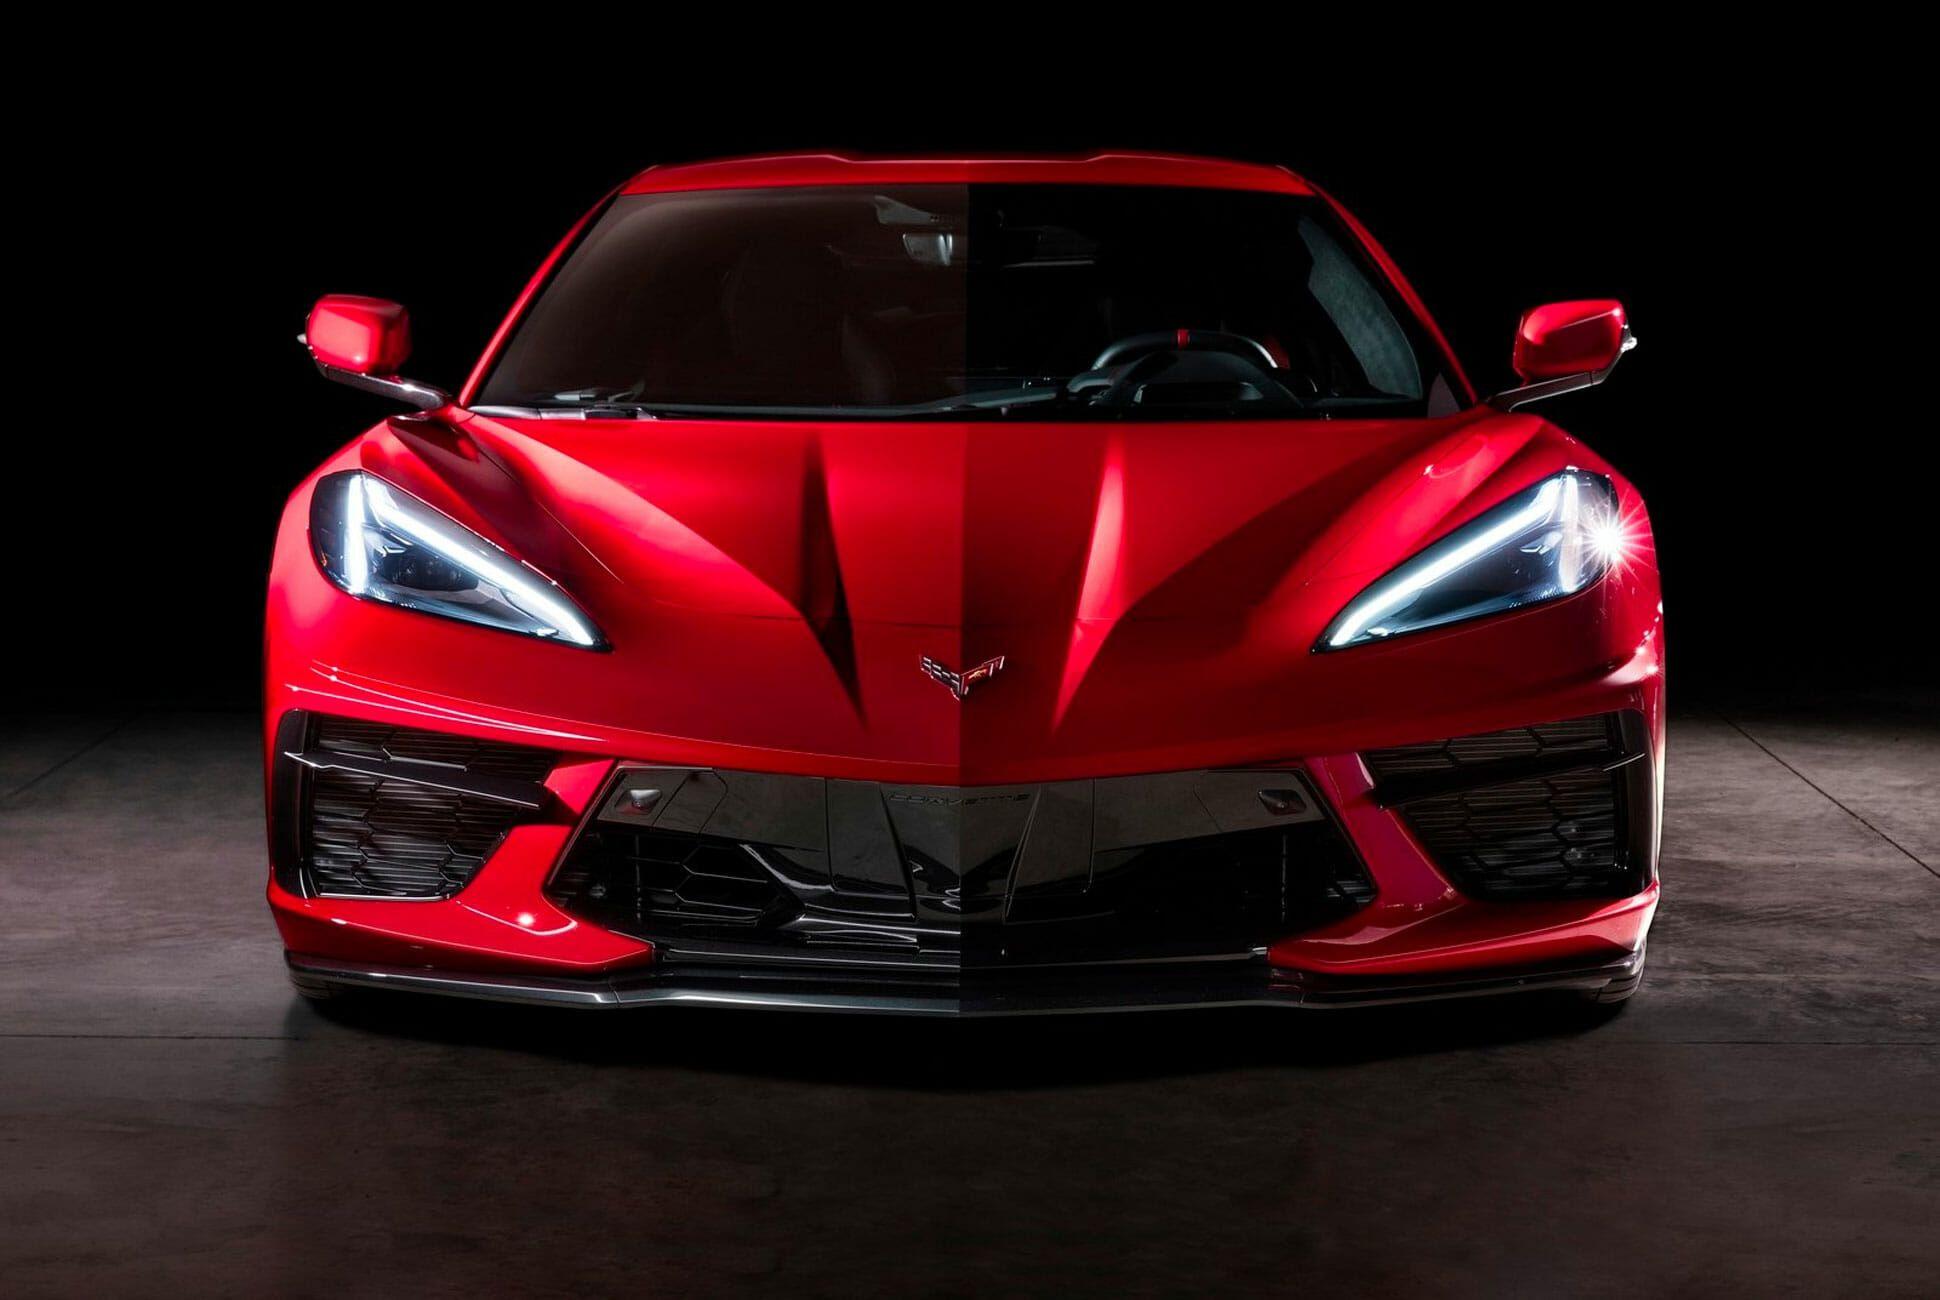 Amazing 2020 Chevrolet Corvette Stingray